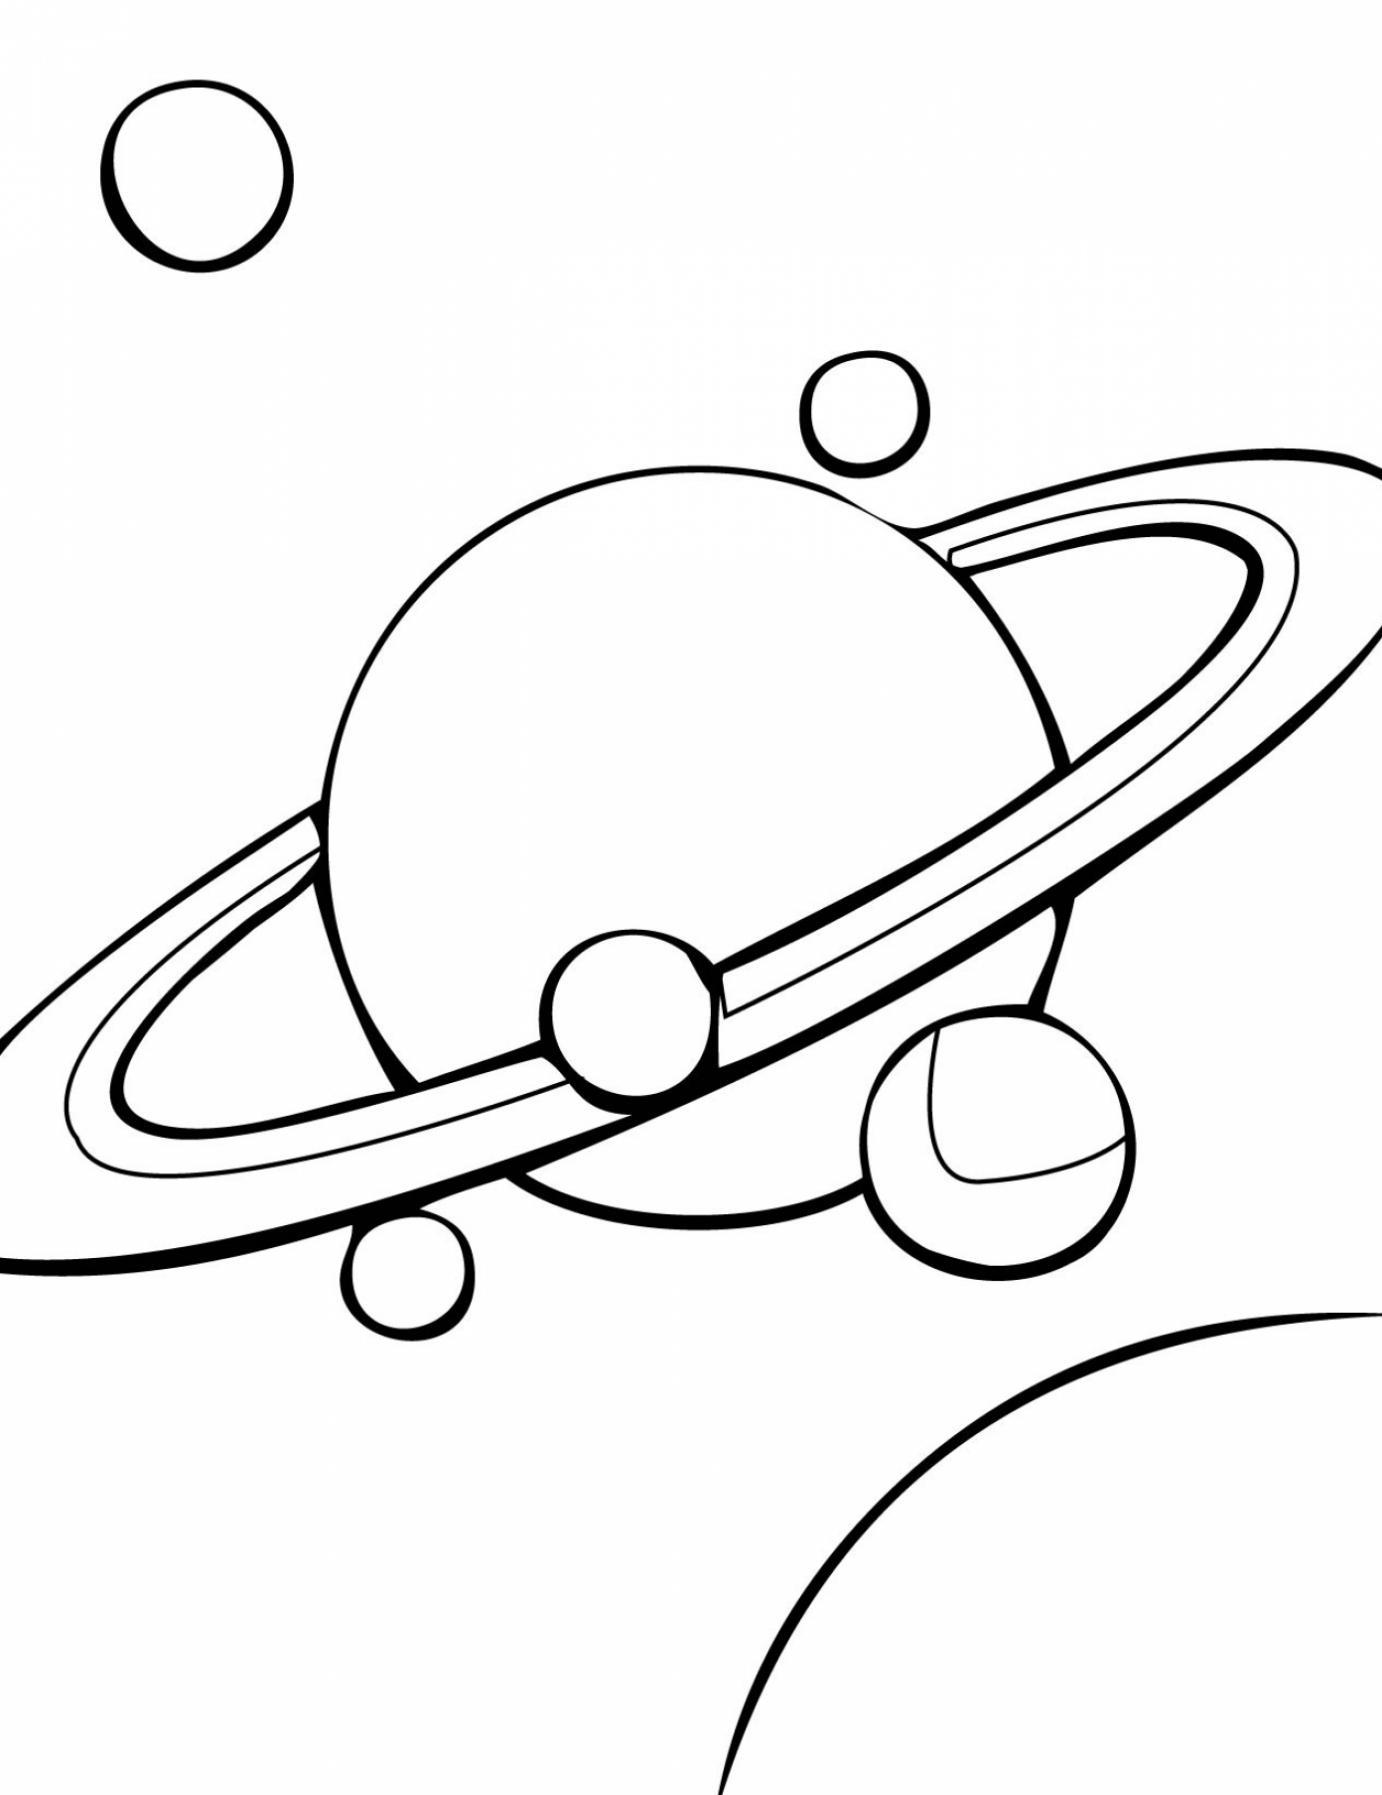 saturn coloring sheet free printable solar system coloring pages for kids coloring saturn sheet